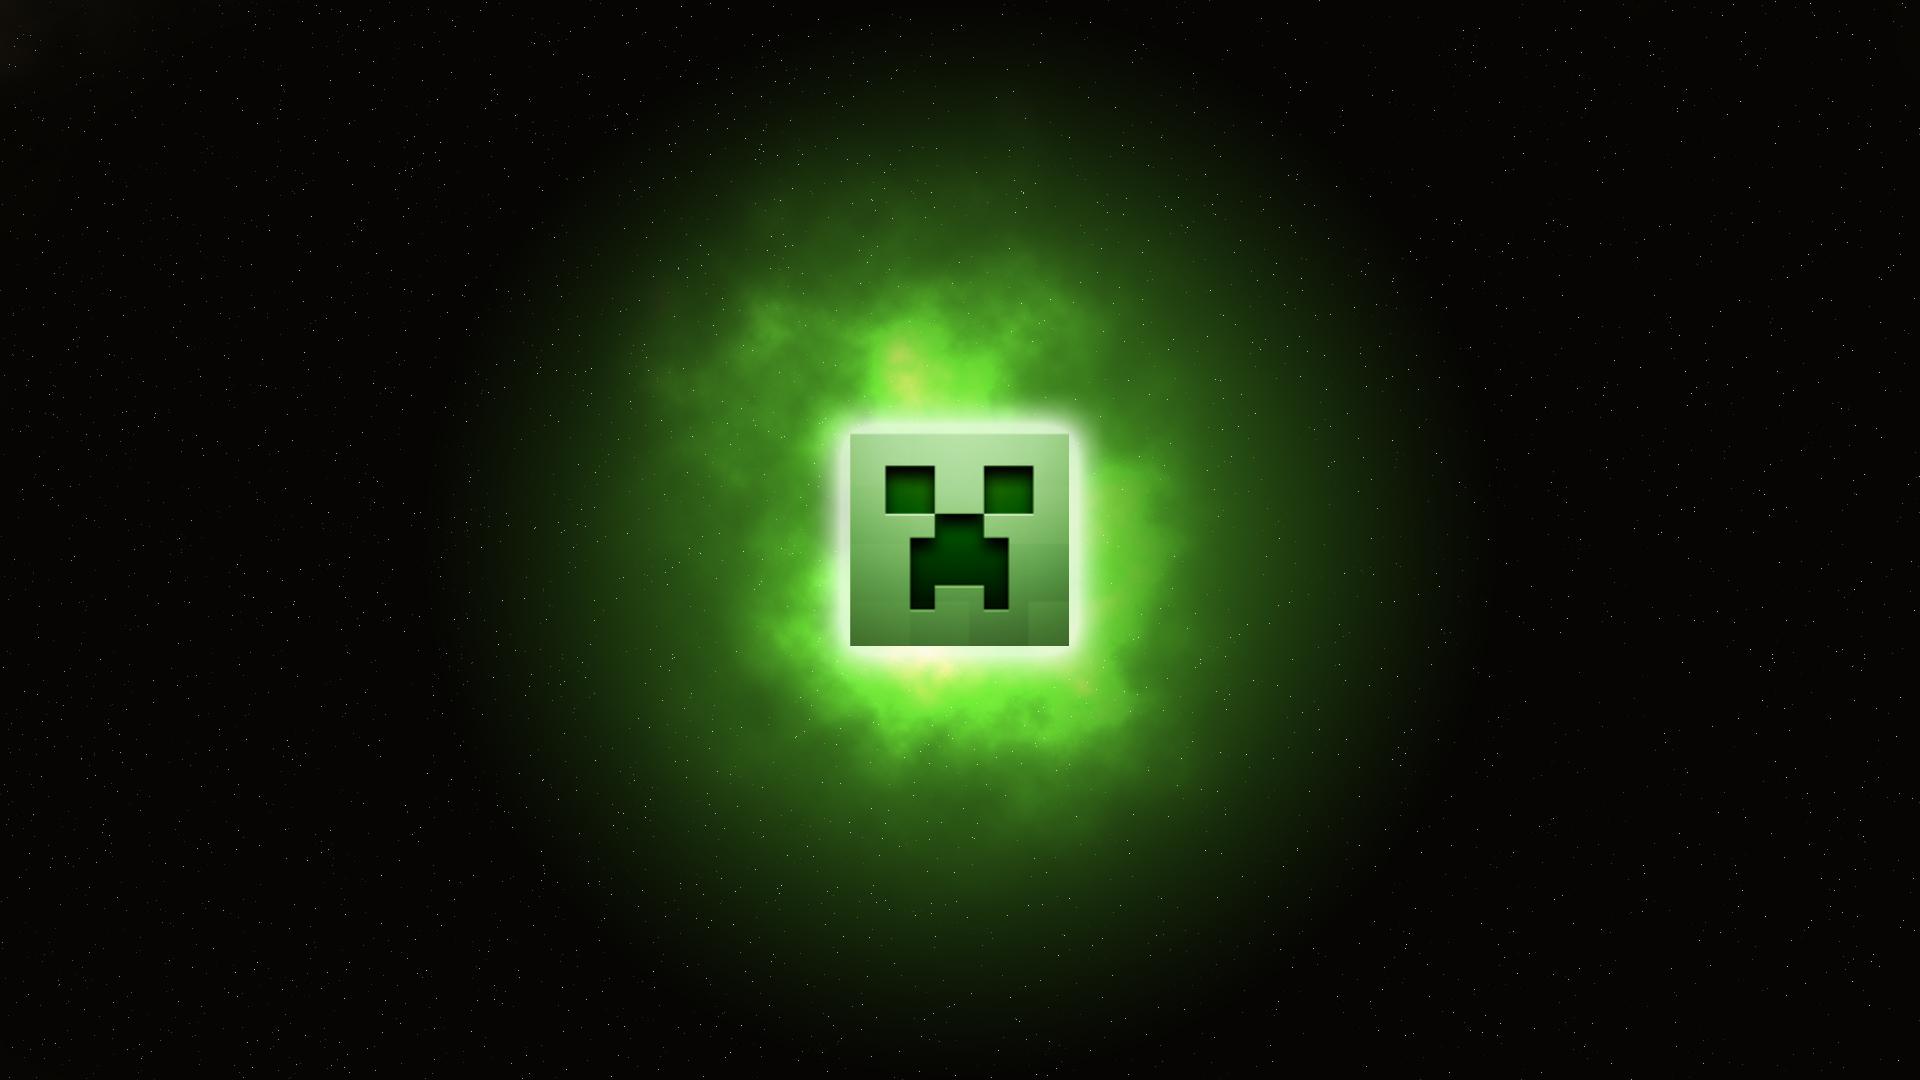 Minecraft Creeper wallpaper 176652 1920x1080